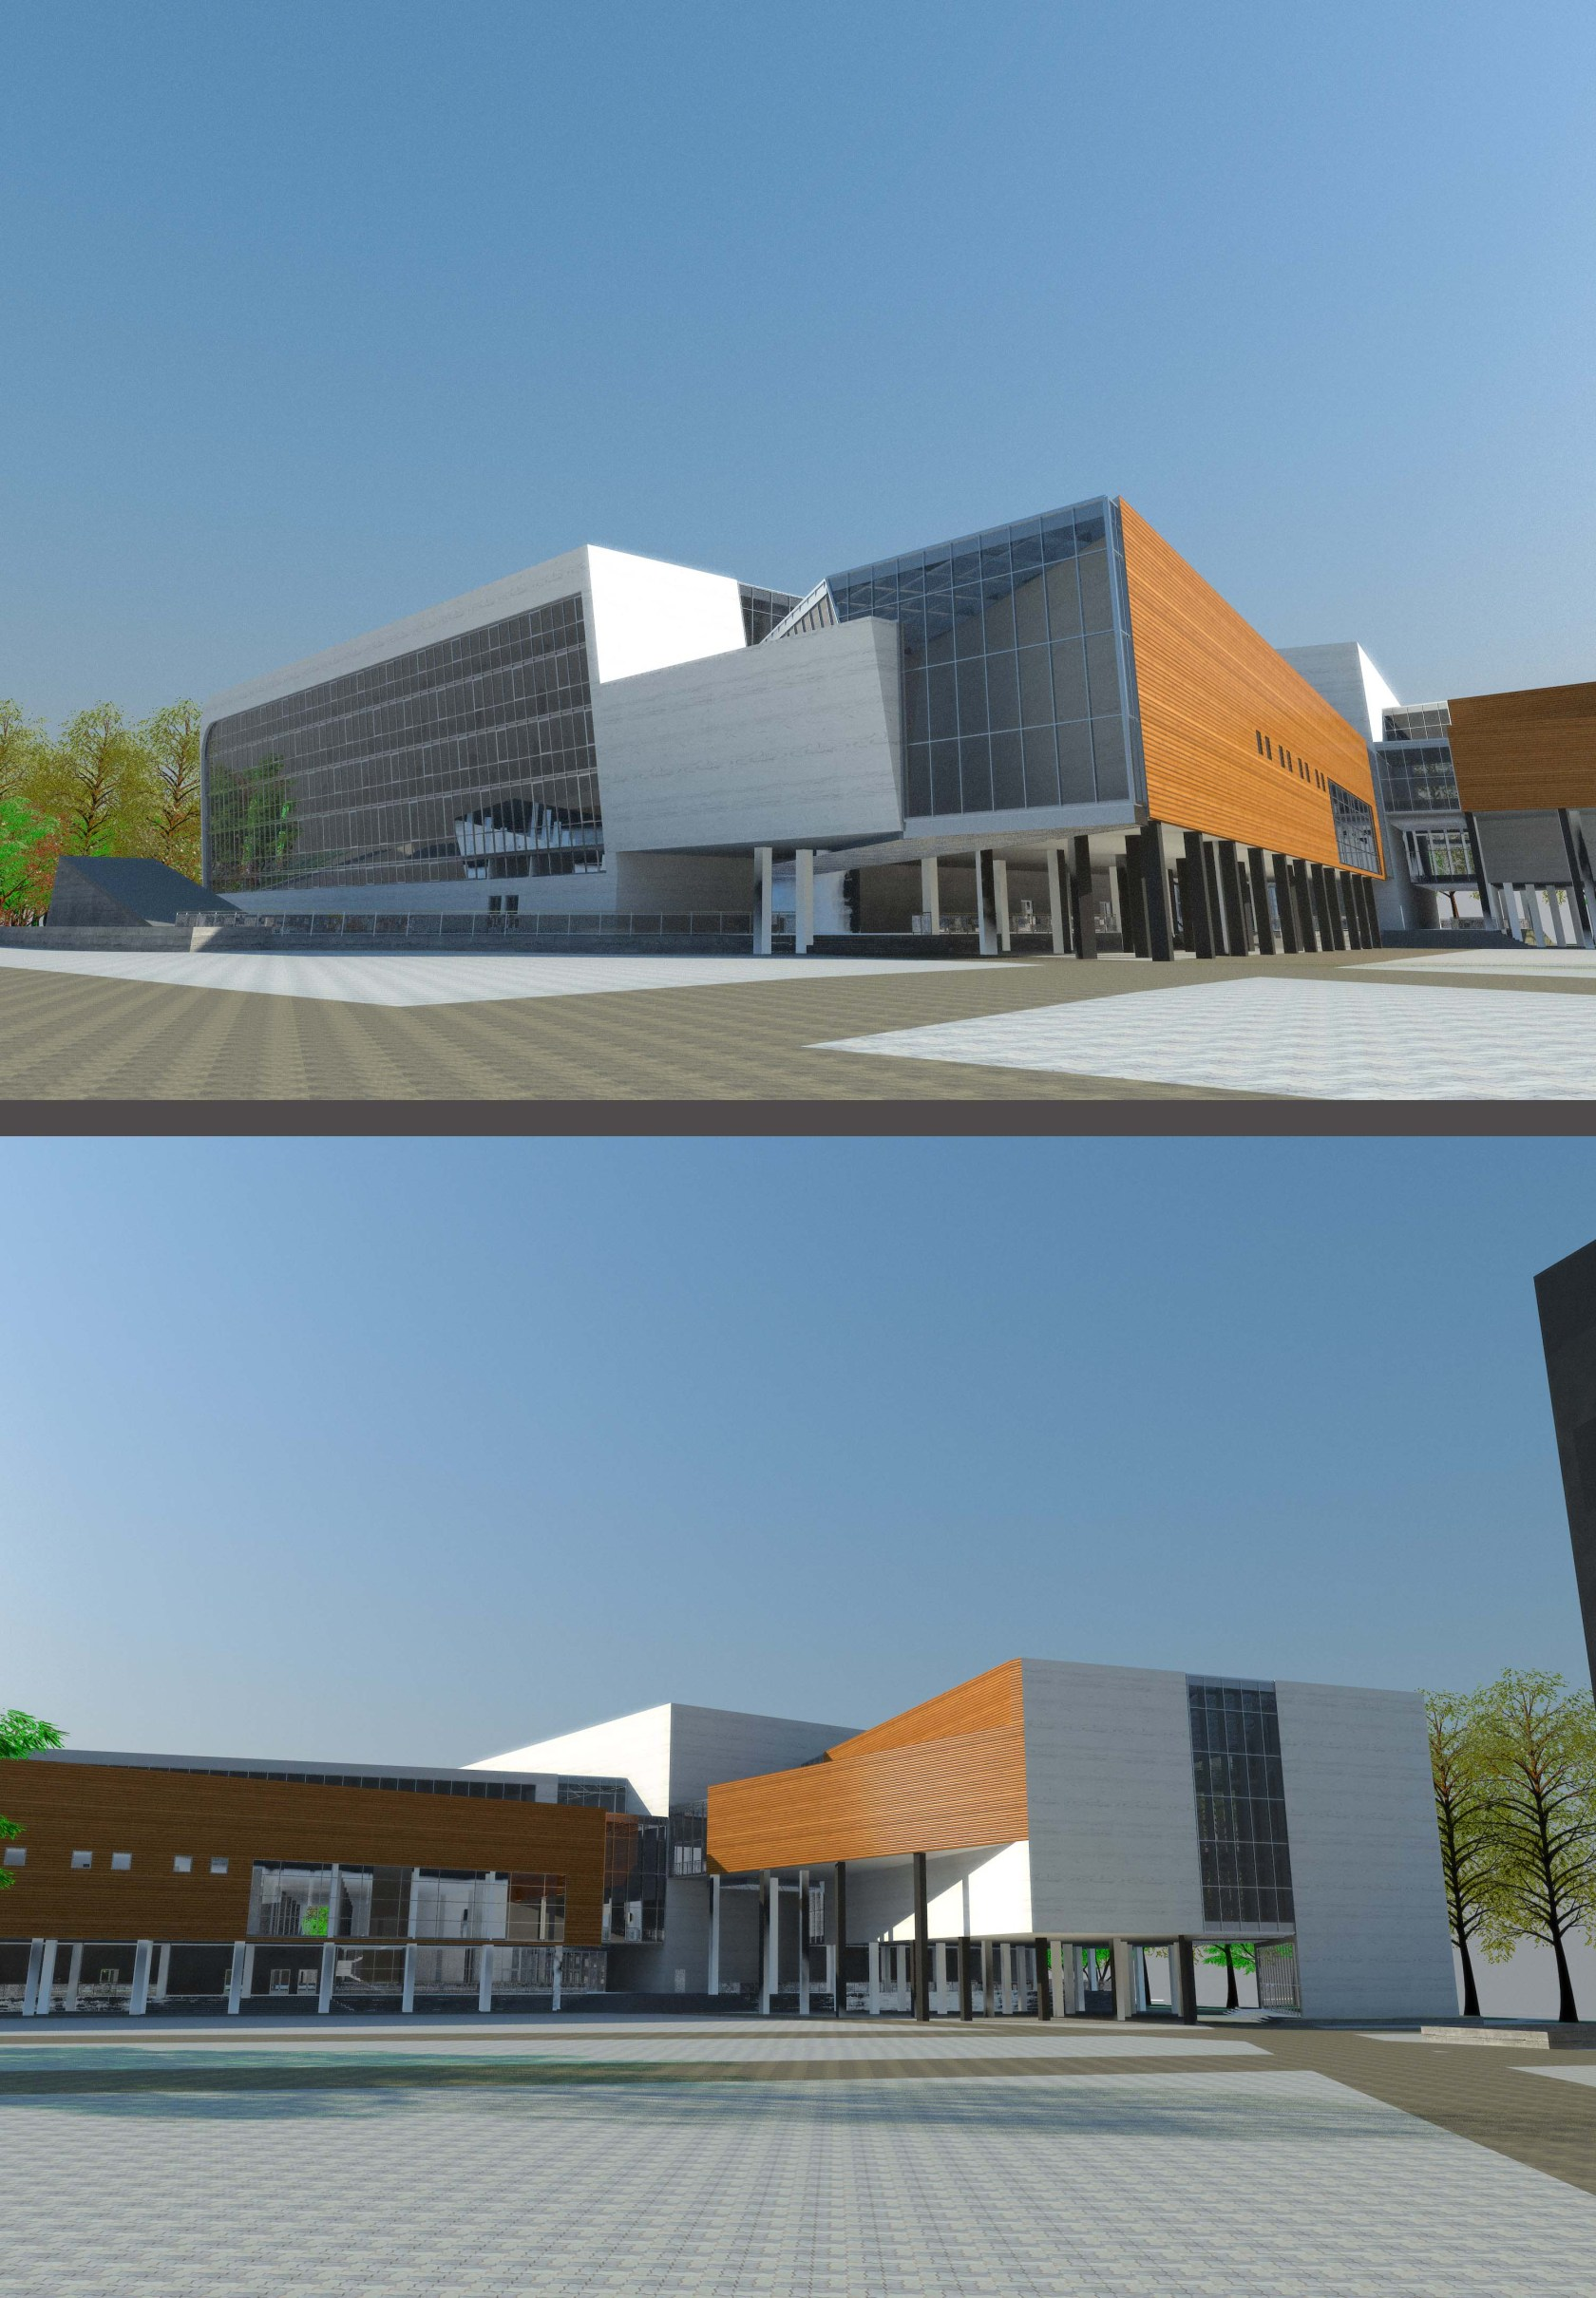 Museum Of Modern Art In Warsaw 2006 - Architizer